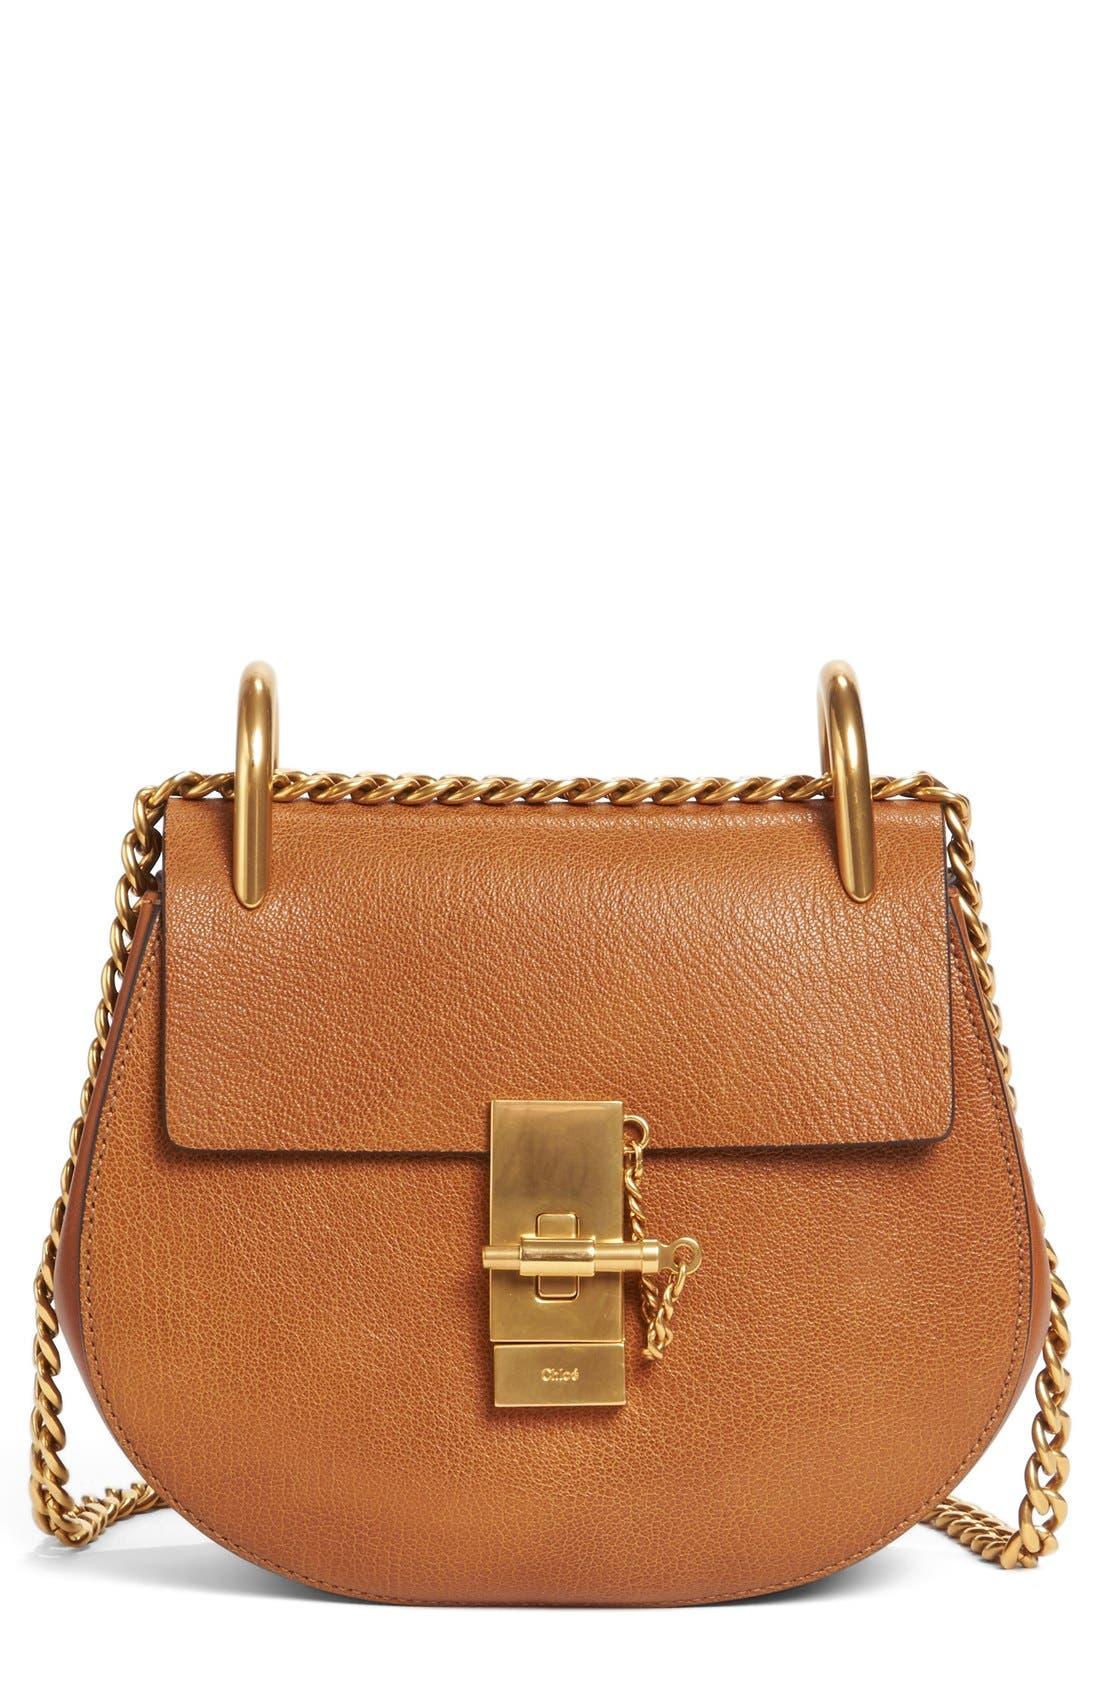 Drew Leather Shoulder Bag,                             Main thumbnail 1, color,                             233